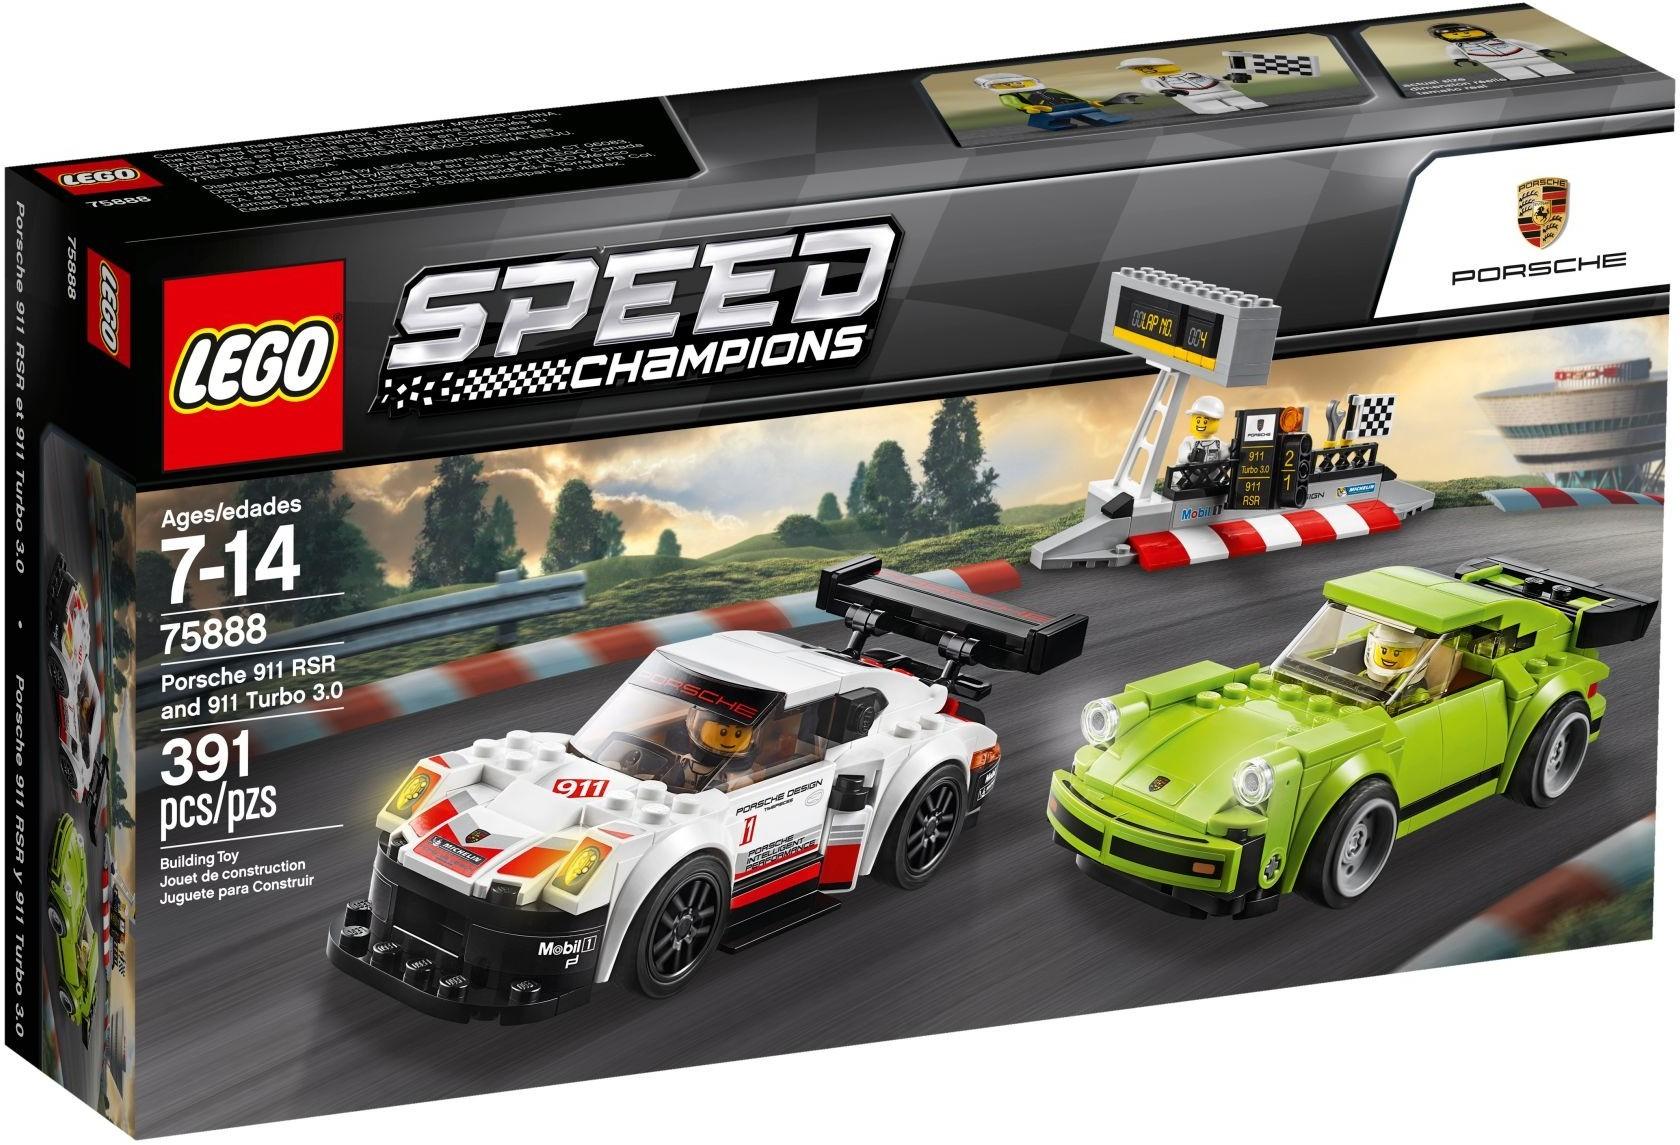 WANGE 2872 Super Racing Cars: Porsche 911 RSR and Porsche 911 Turbo 3.0 3